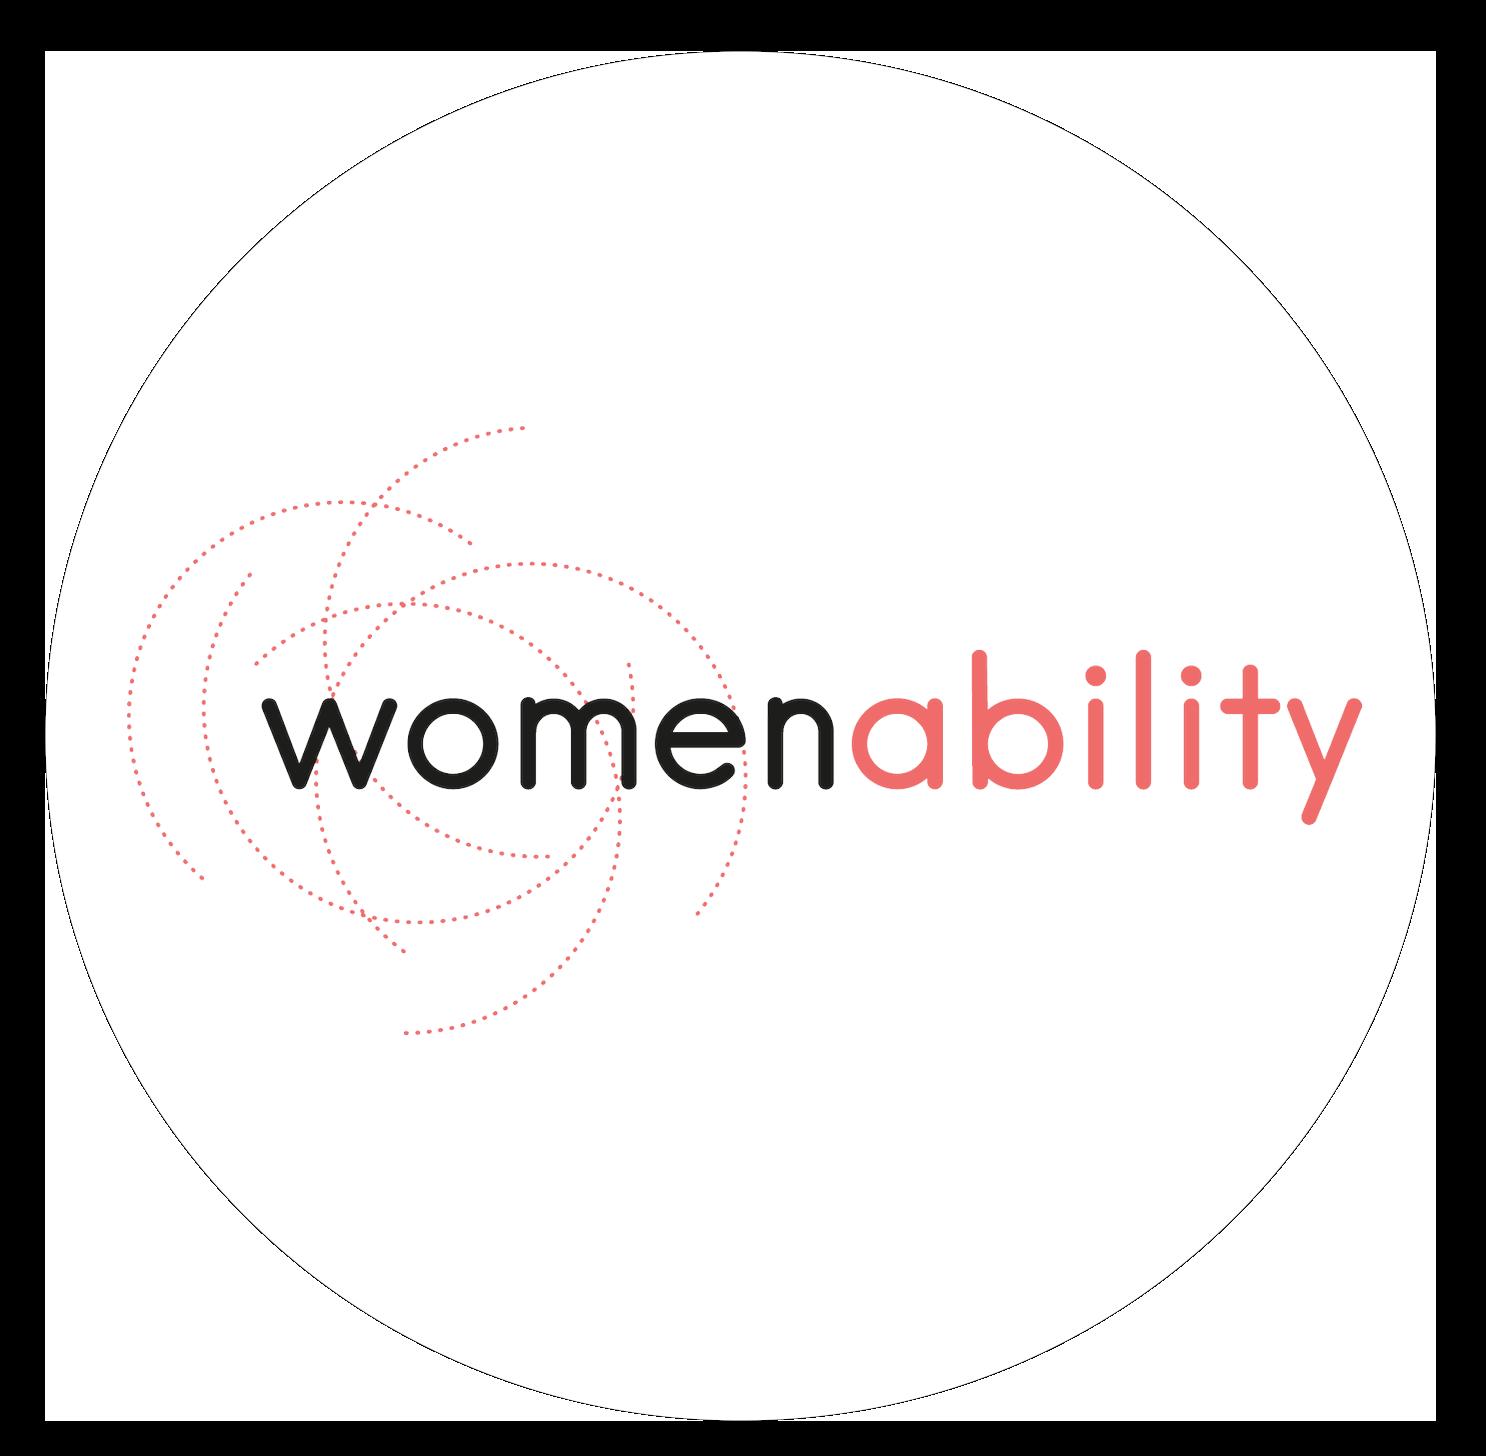 Womenability